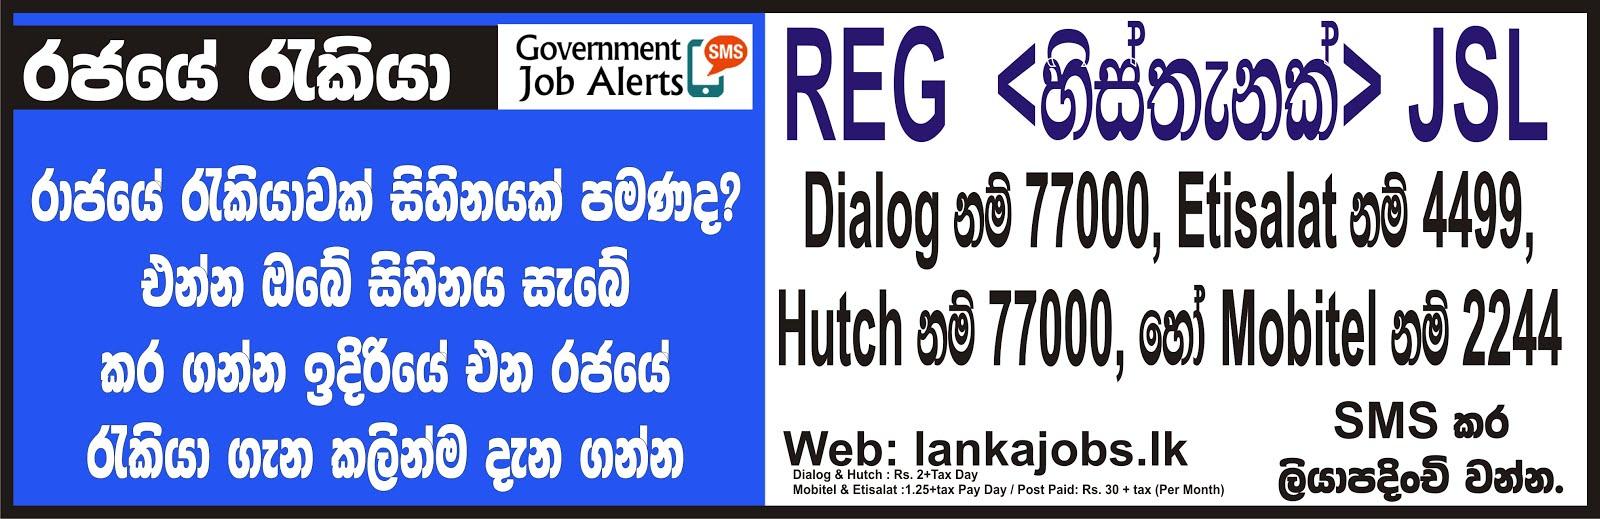 Job alert service